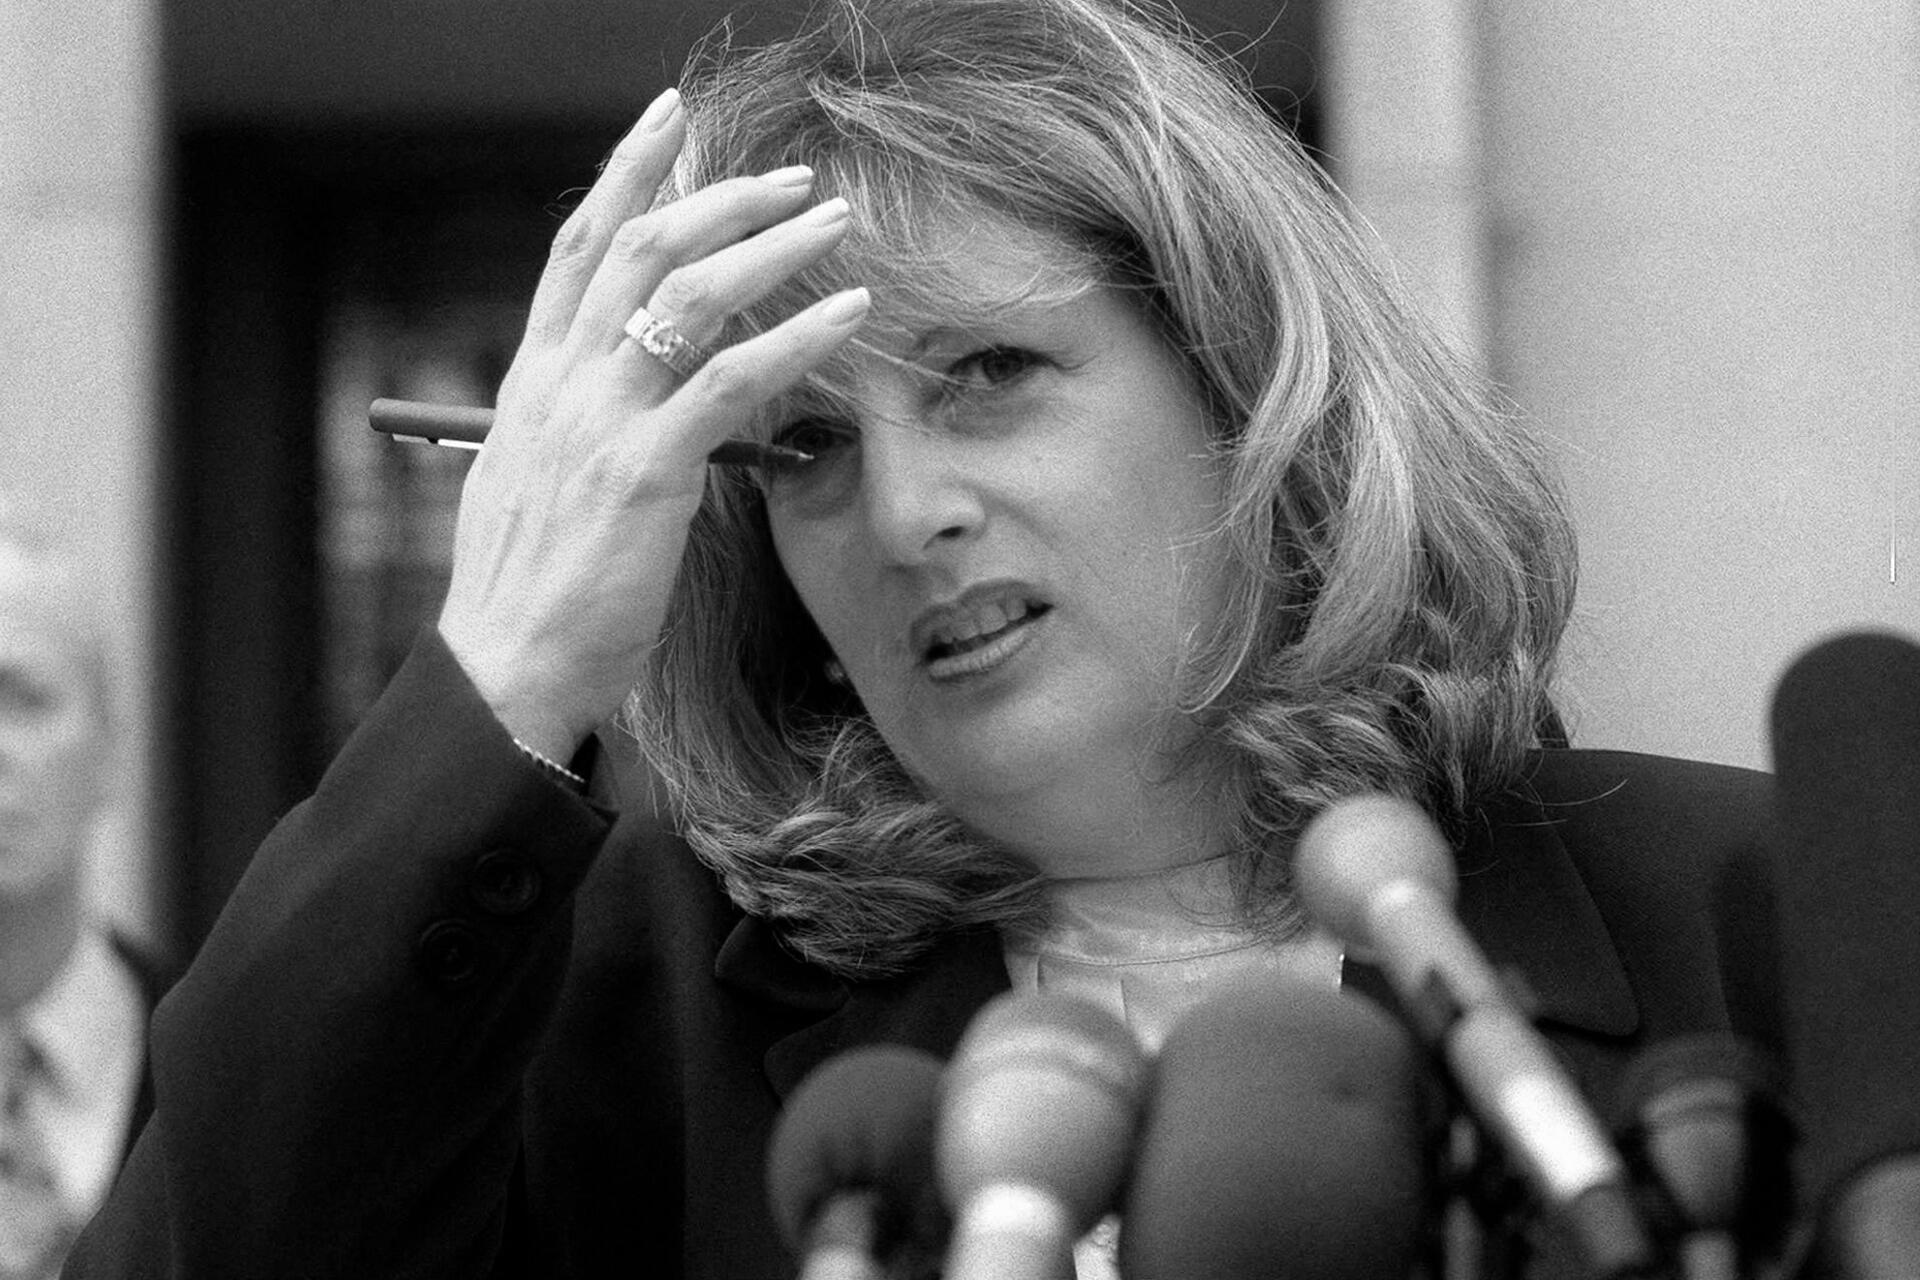 Bild zu Schlüsselfigur in Lewinsky-Affäre Linda Tripp ist tot